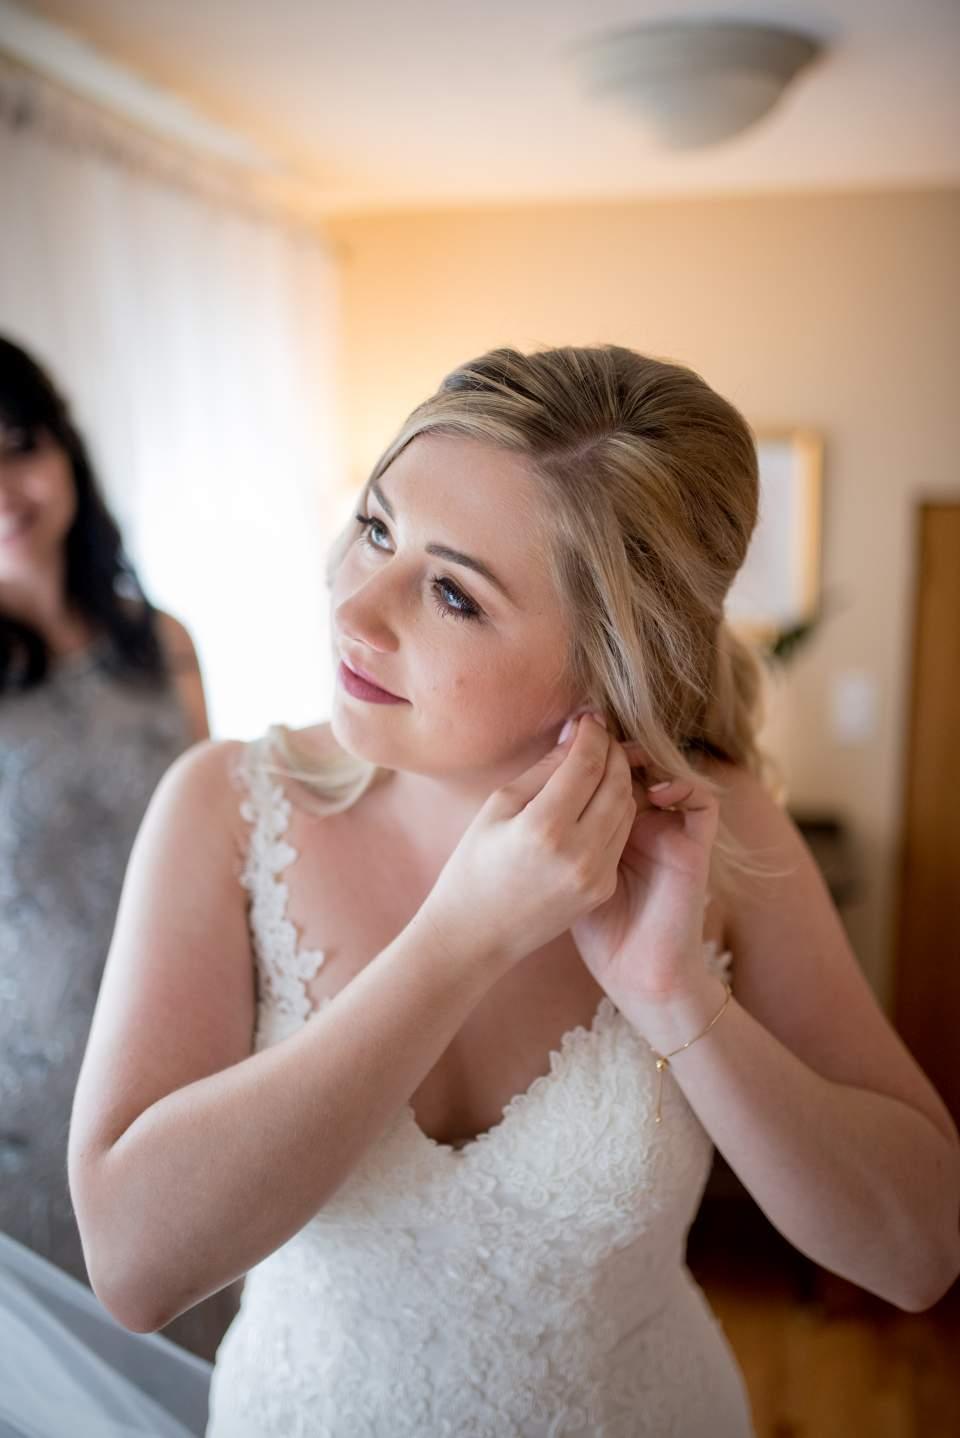 beautiful bride putting her earrings on